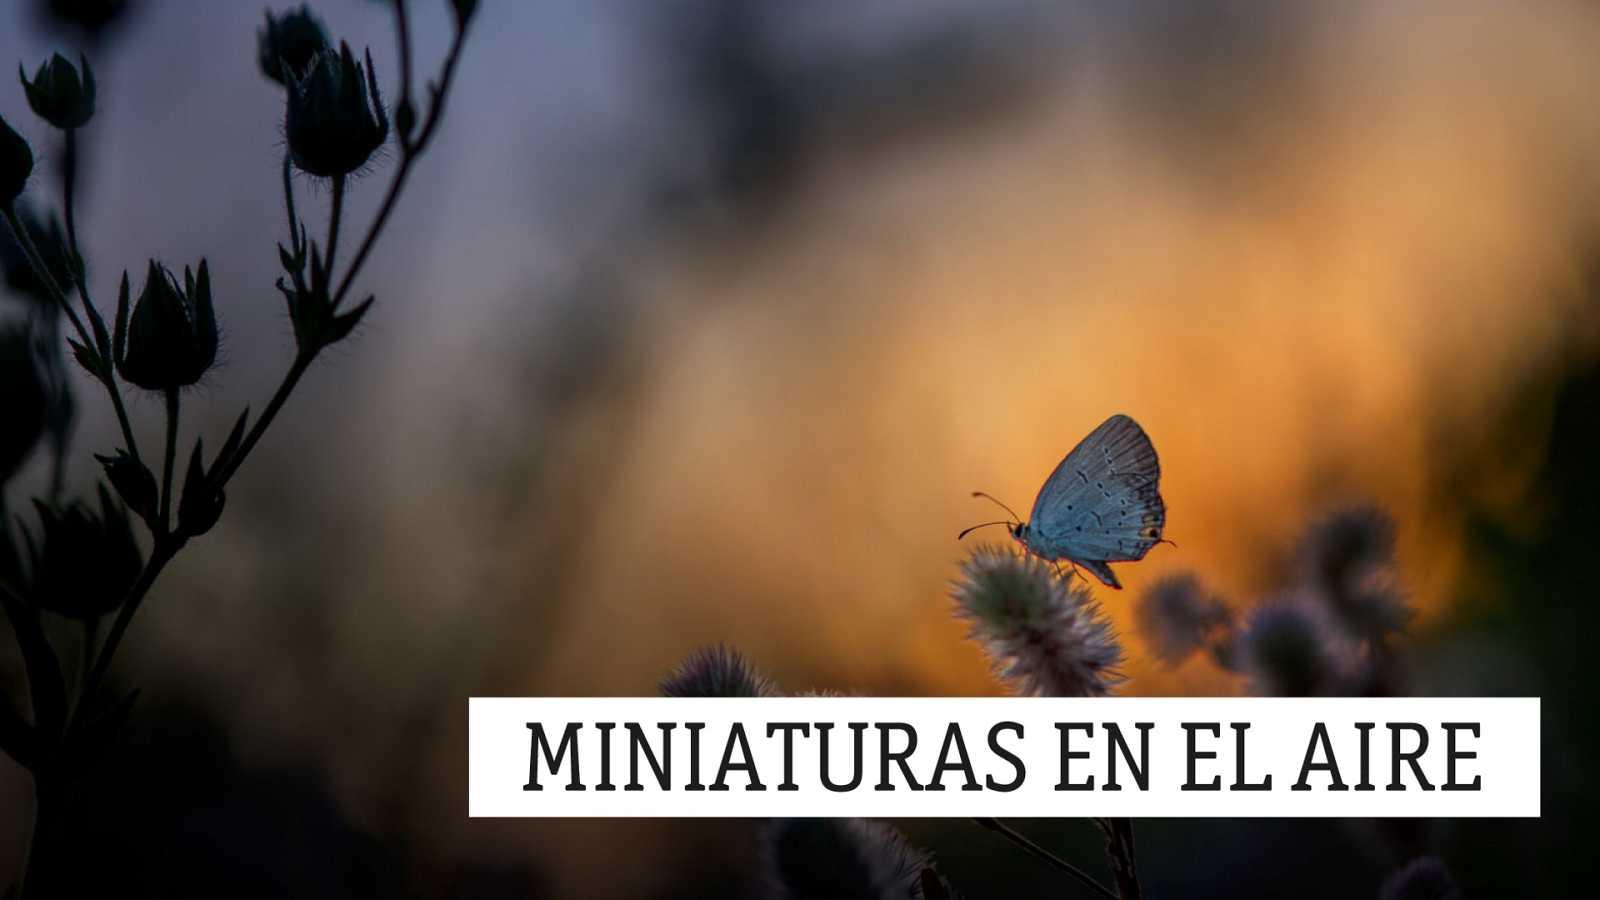 Miniaturas en el aire - En enséñame a mirar como tú miras - 25/02/21 - escuchar ahora